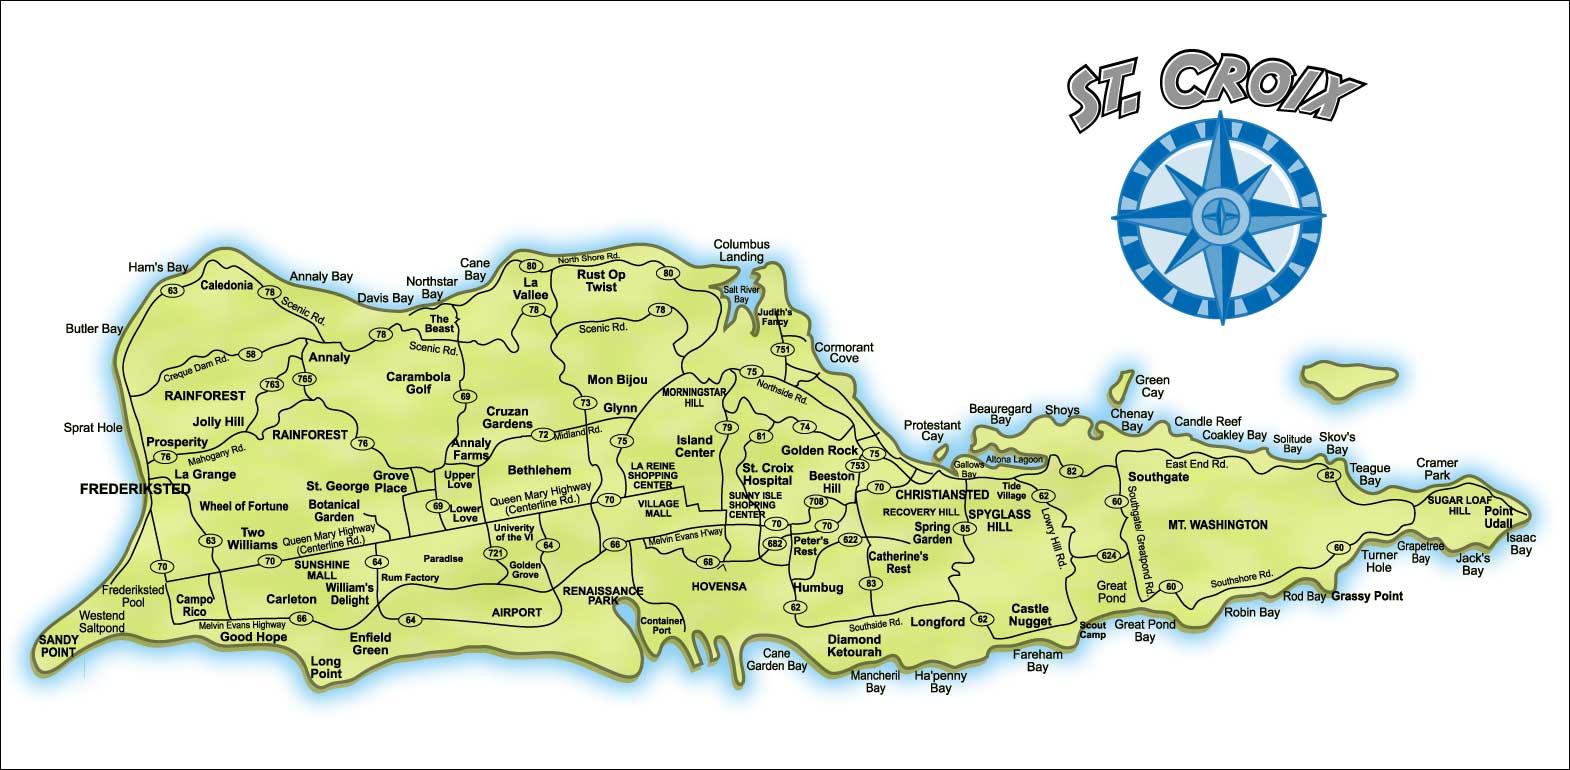 St. Croix Virgin Islands Map